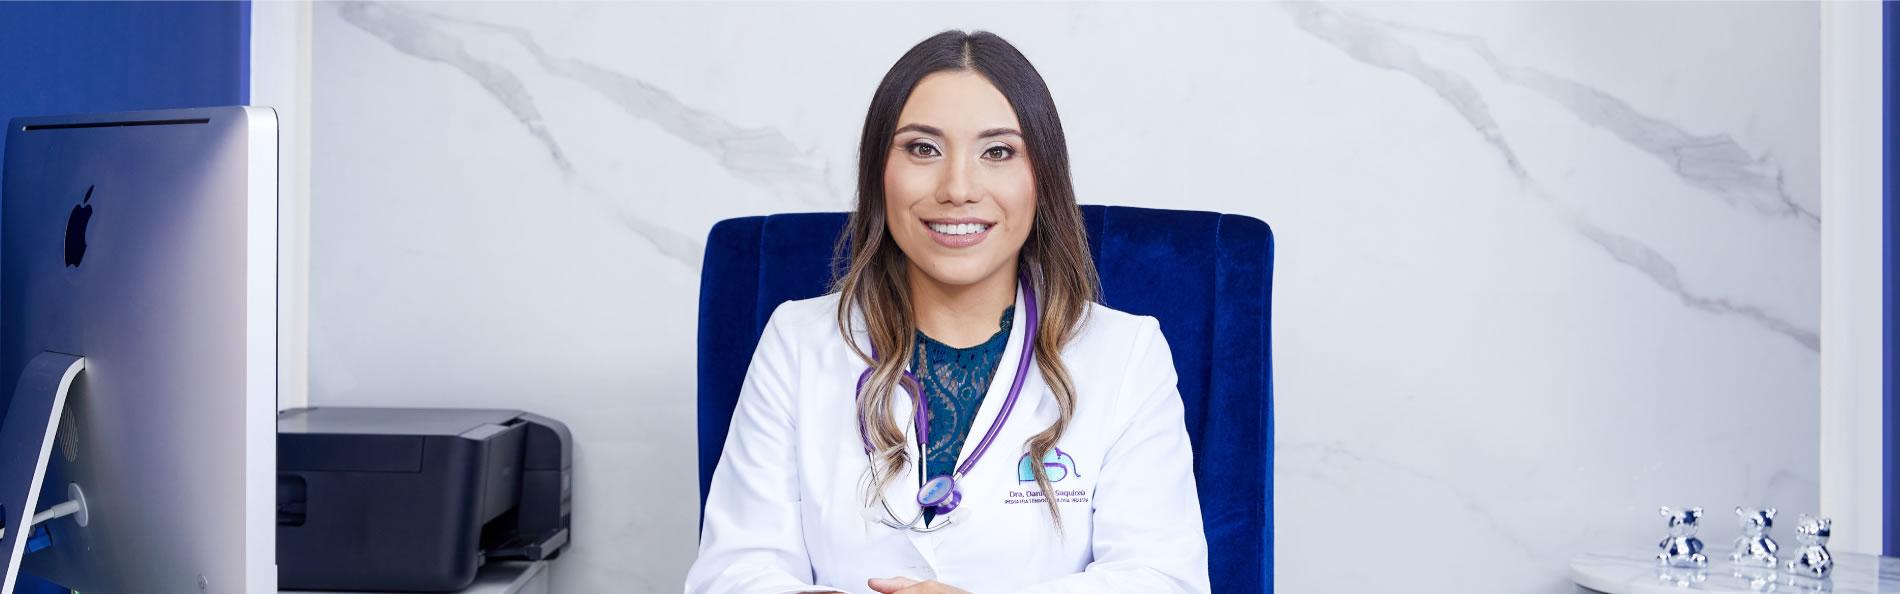 Dra Daniela Saquicela Blog